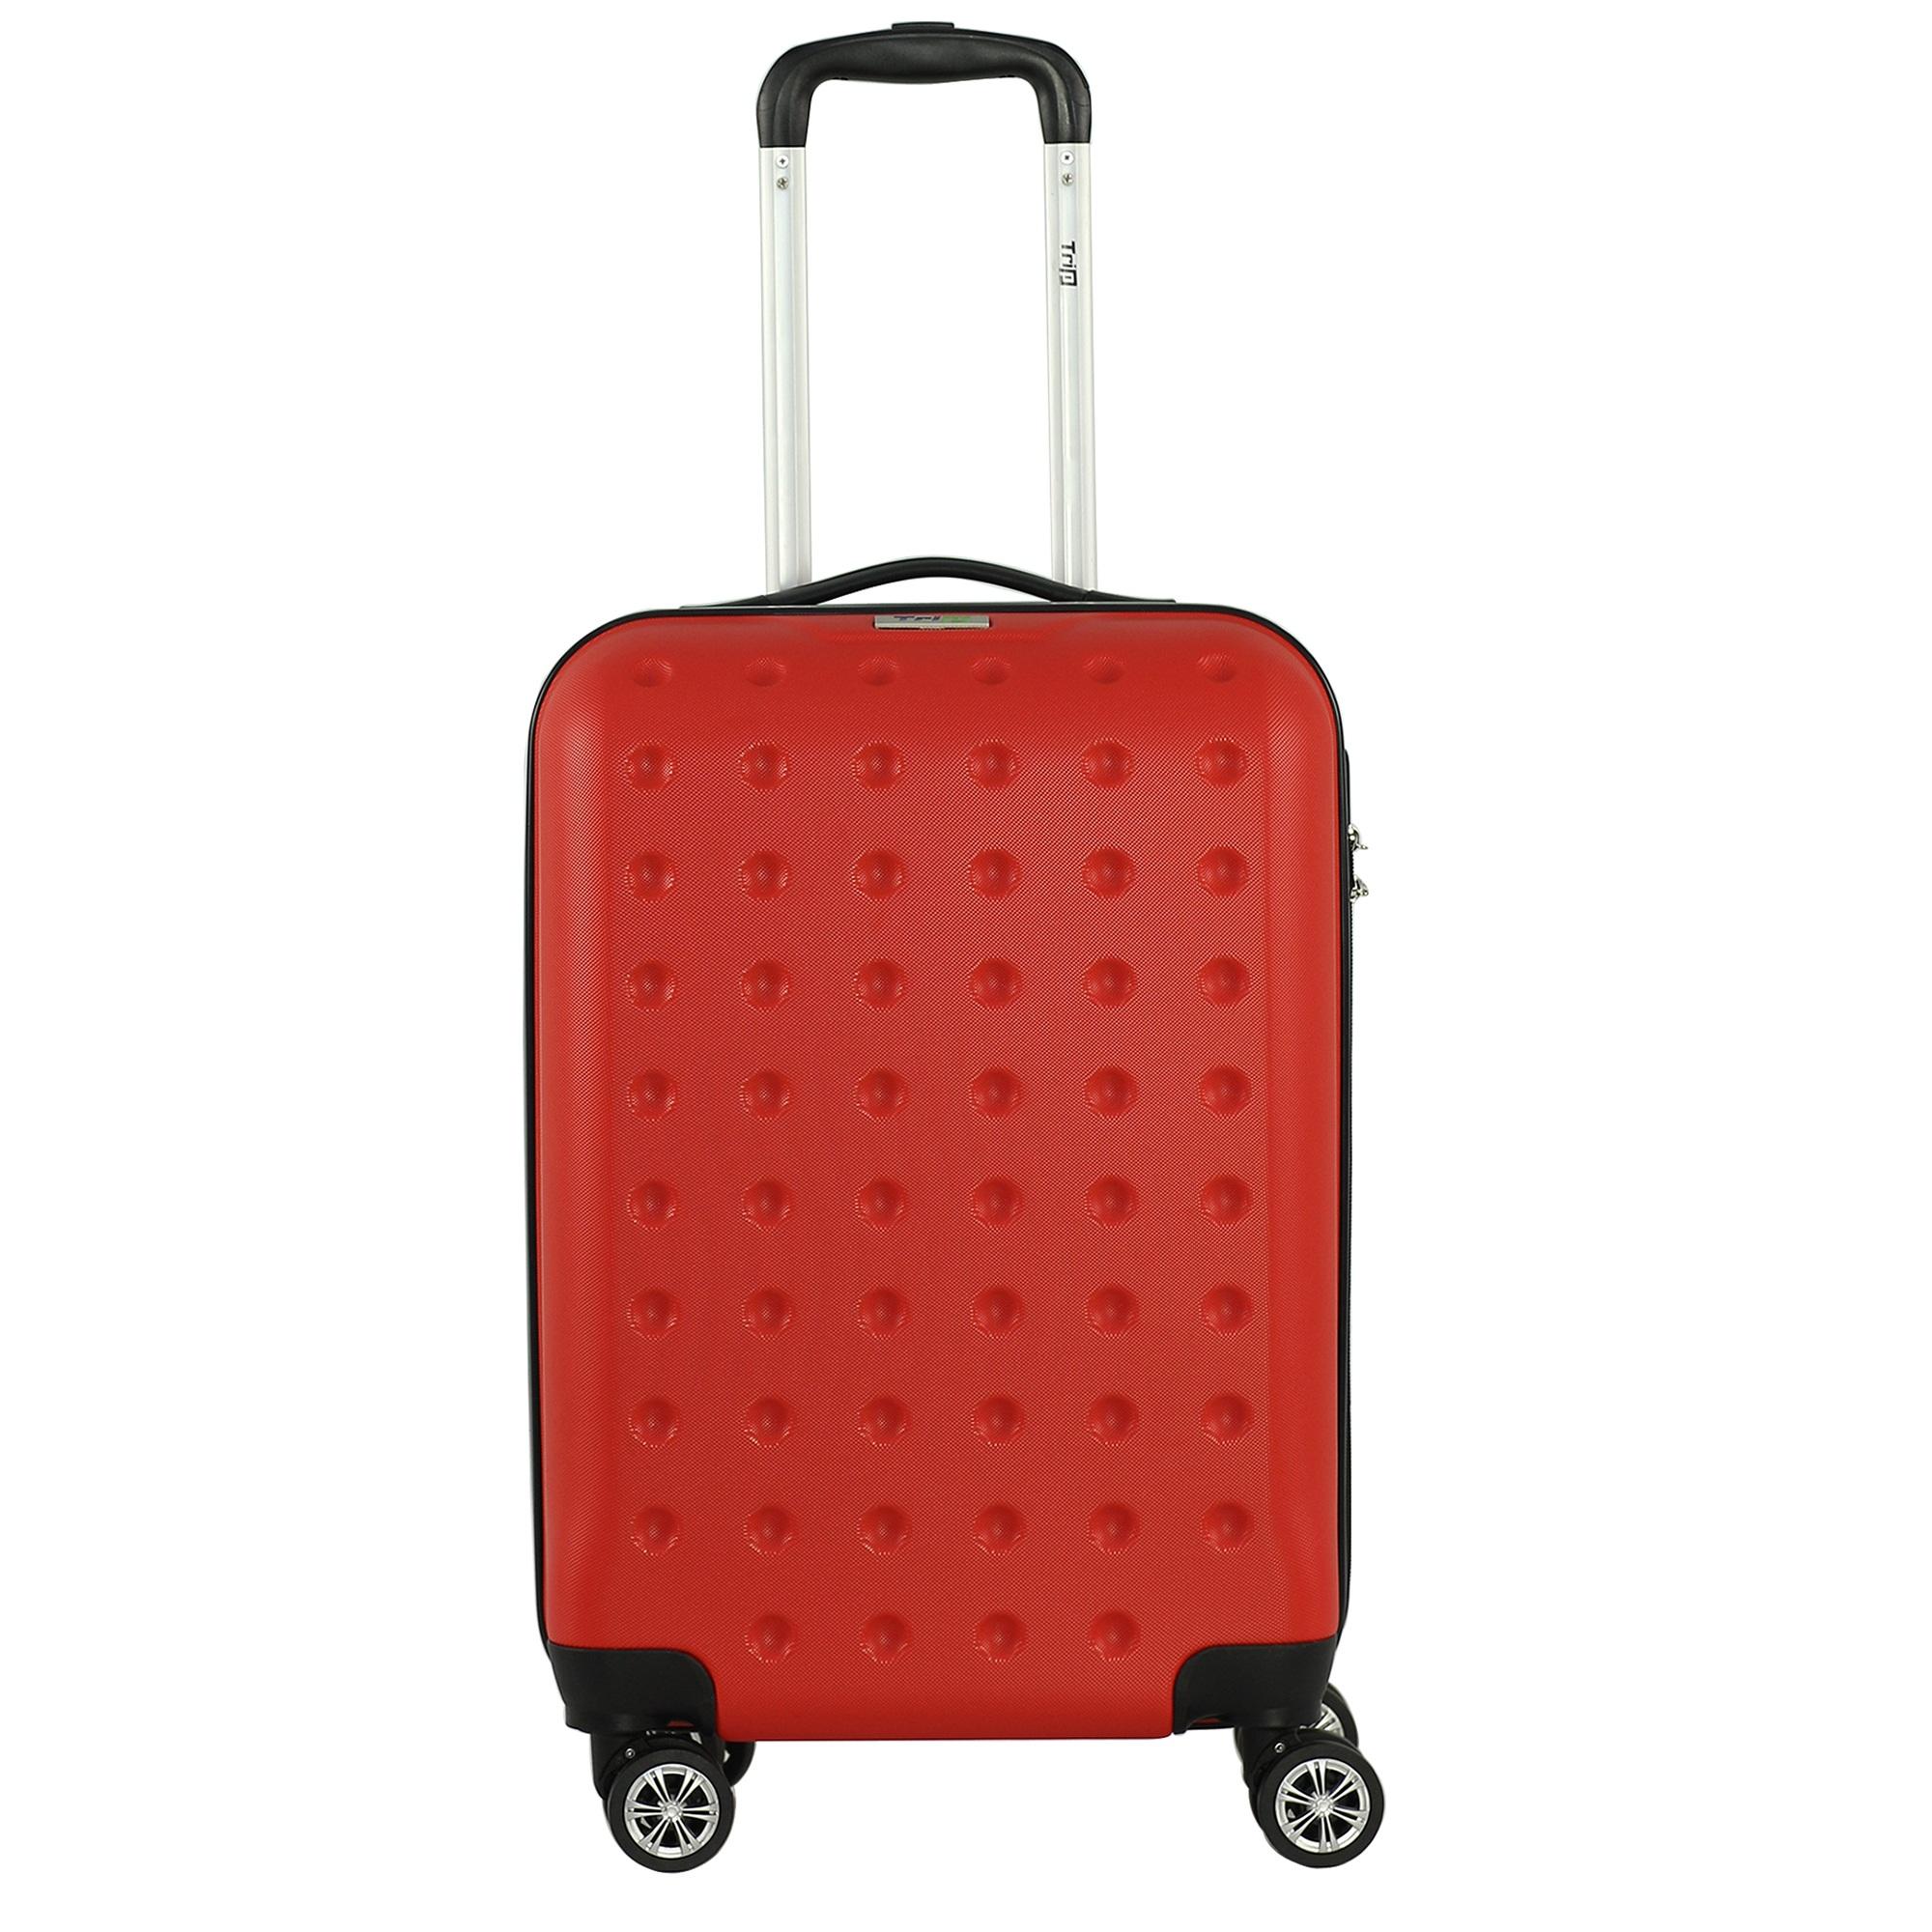 Vali Trip P13 size 50cm (20 inches) đỏ